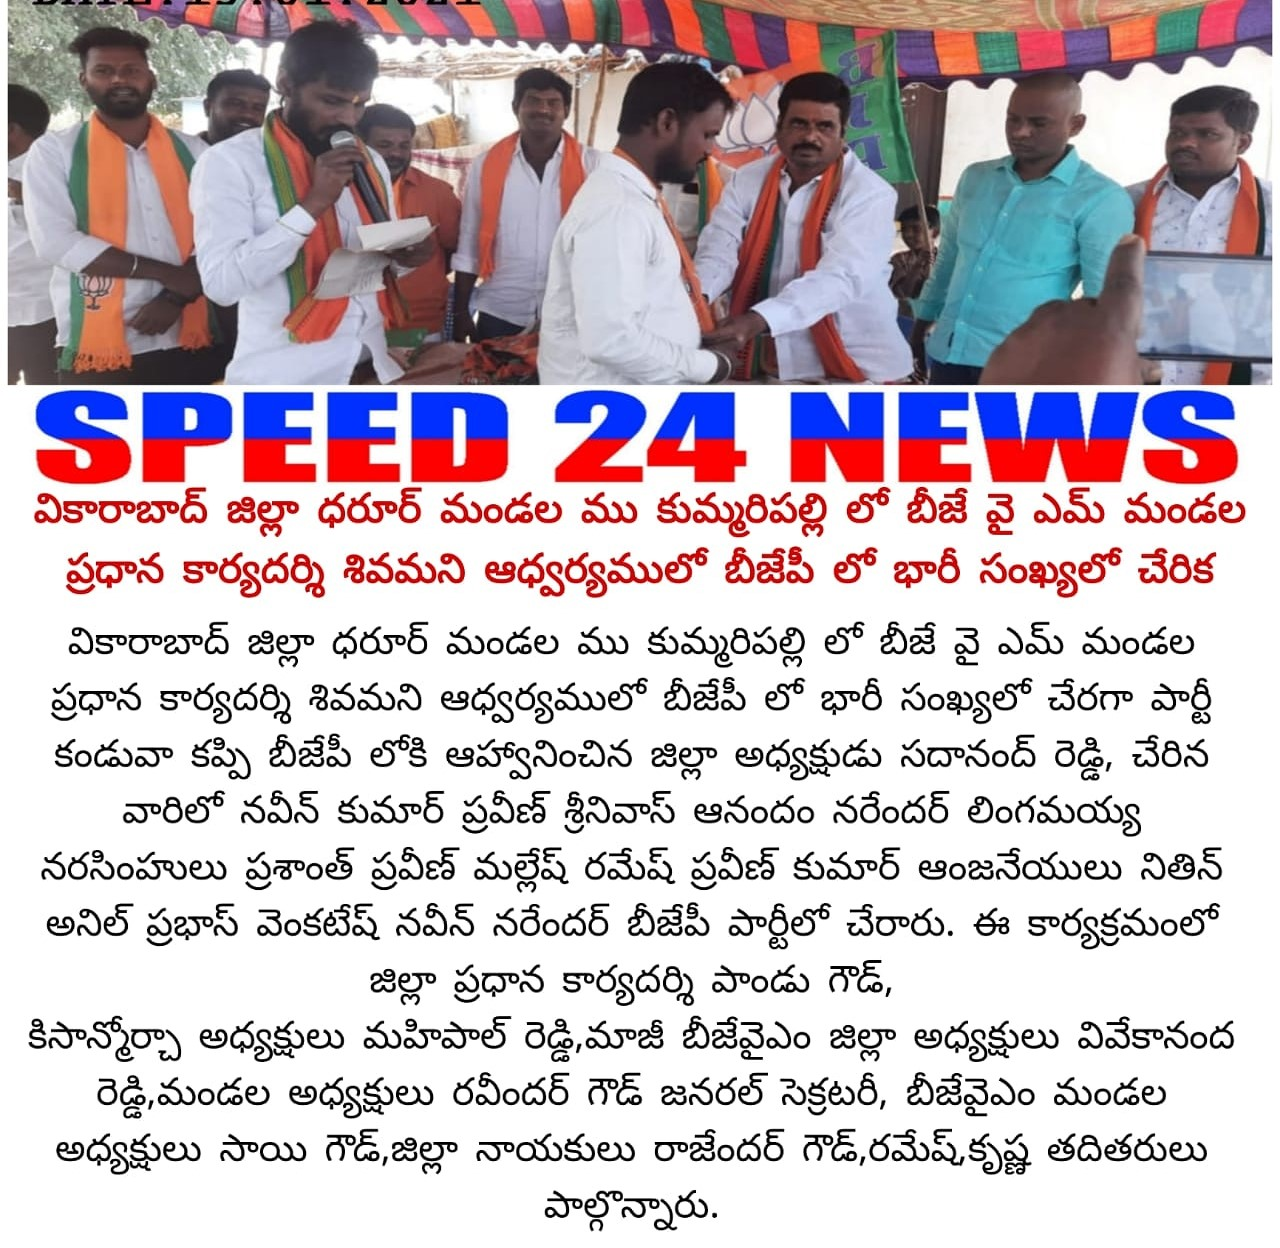 Ashamolla Shivamani Goud   BJYM General Secretary   Active Member   Party Activist   ABVP   RSS   BJP   Vikarabad Nagaram   Dharur   Vikarabad   Telangana   theLeadersPage